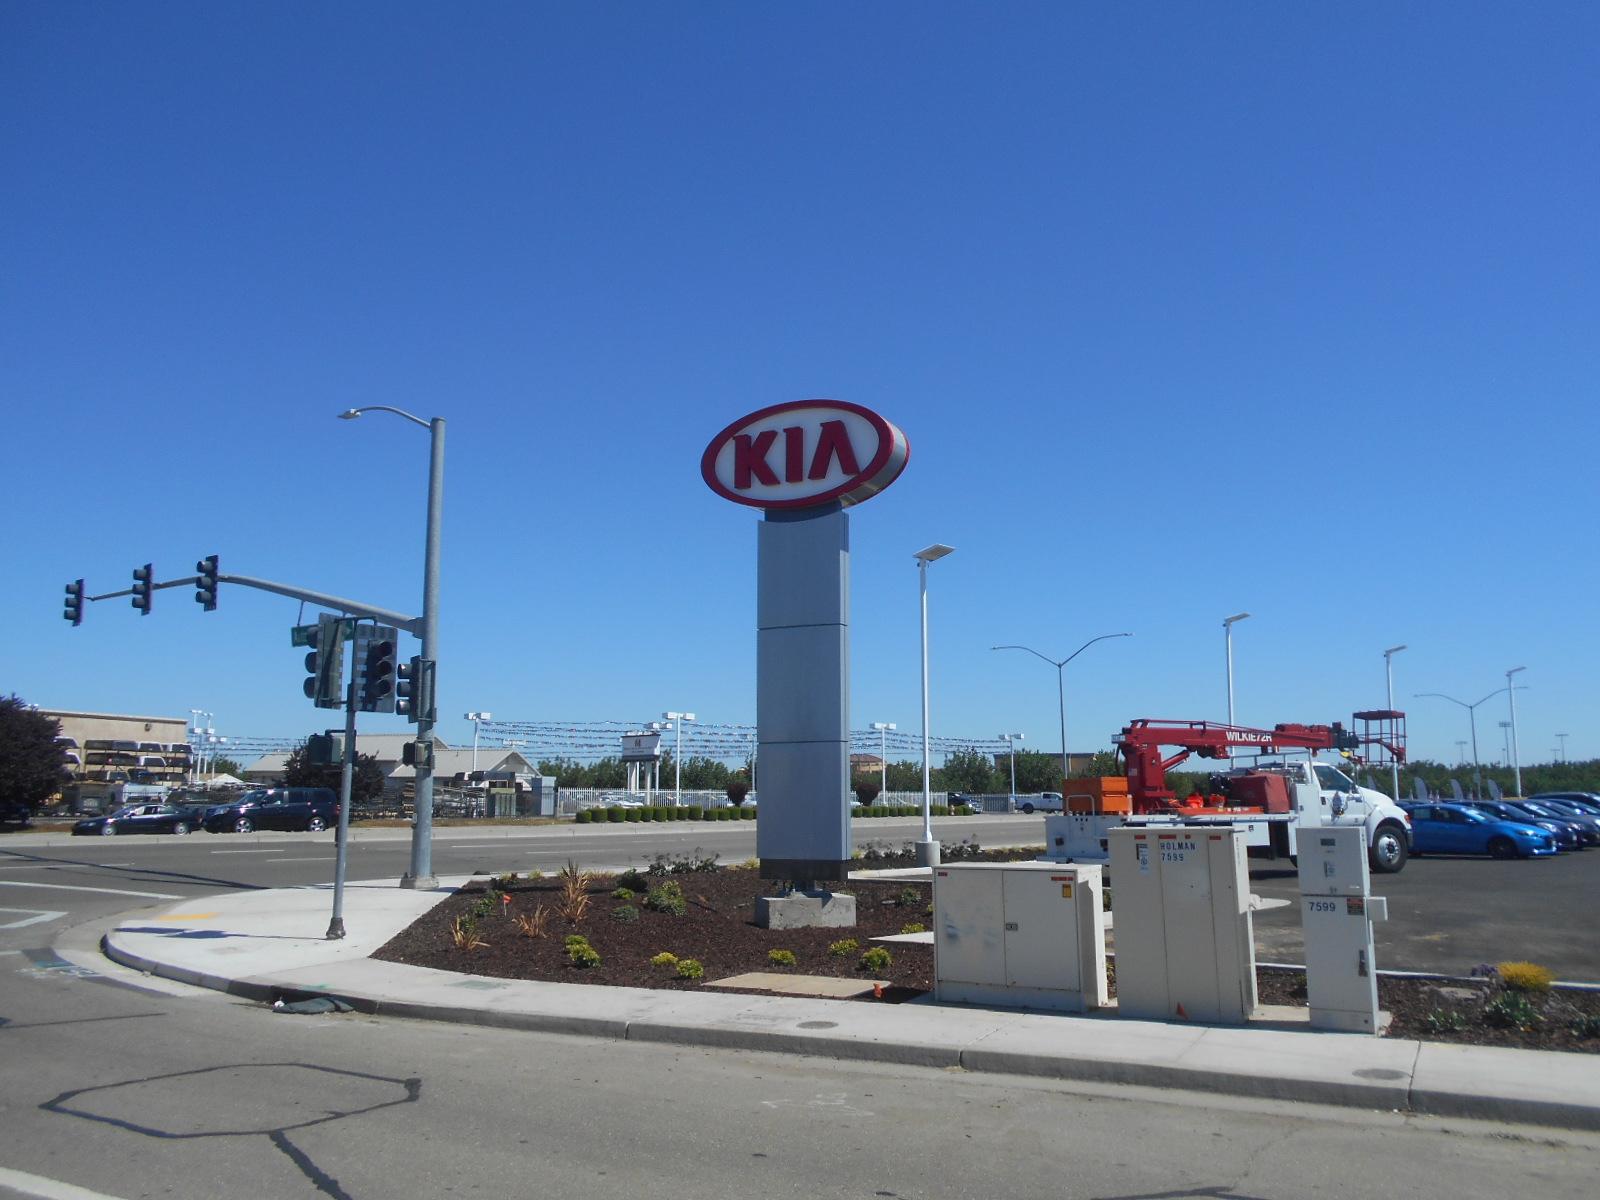 KIA Car Dealership Stockton